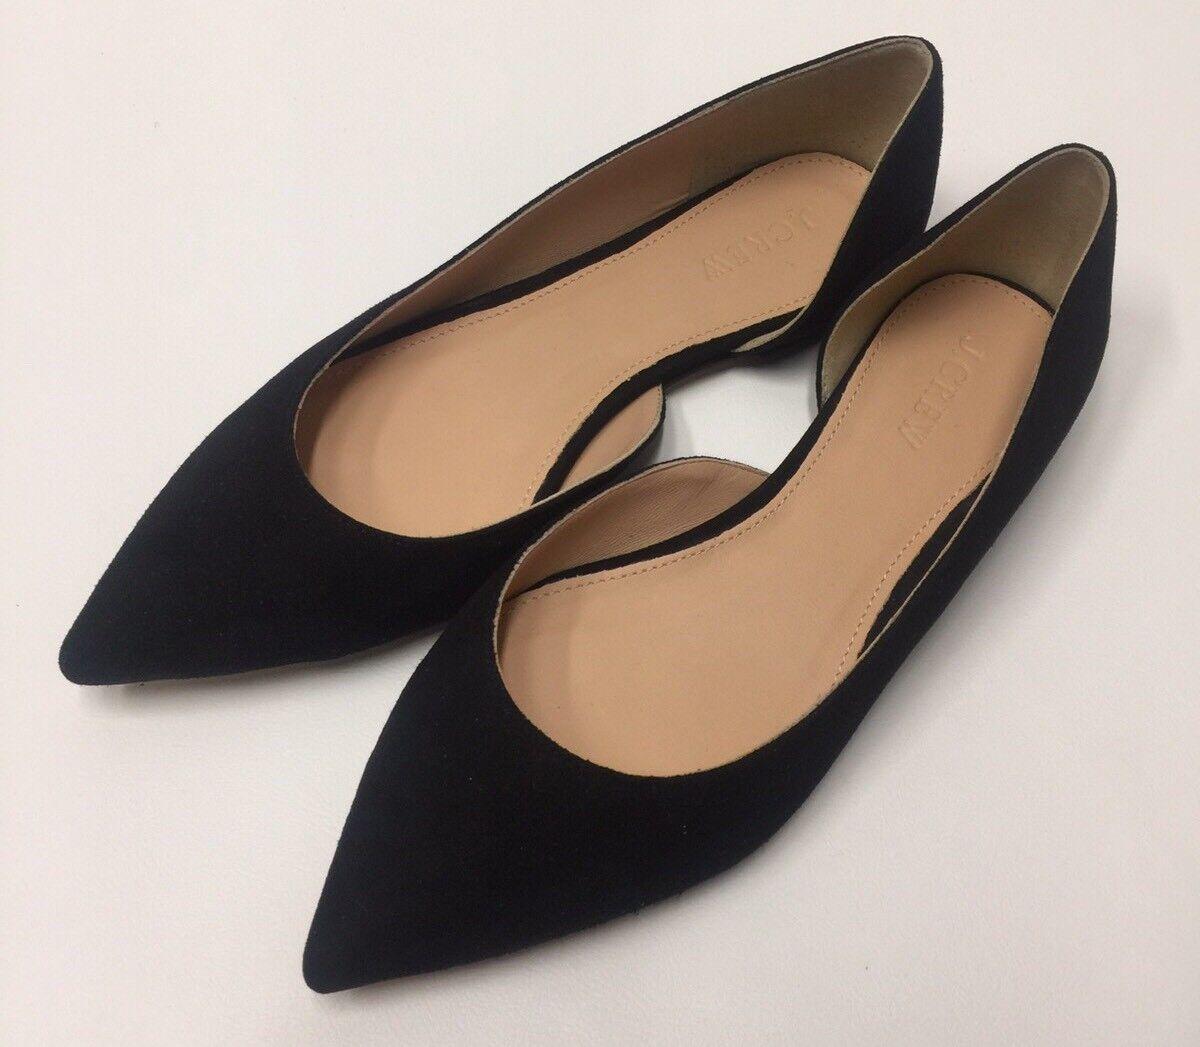 J CREW 138   Audrey Flats in suede sz 6.5 NOIR Chaussures G0891 NEUF